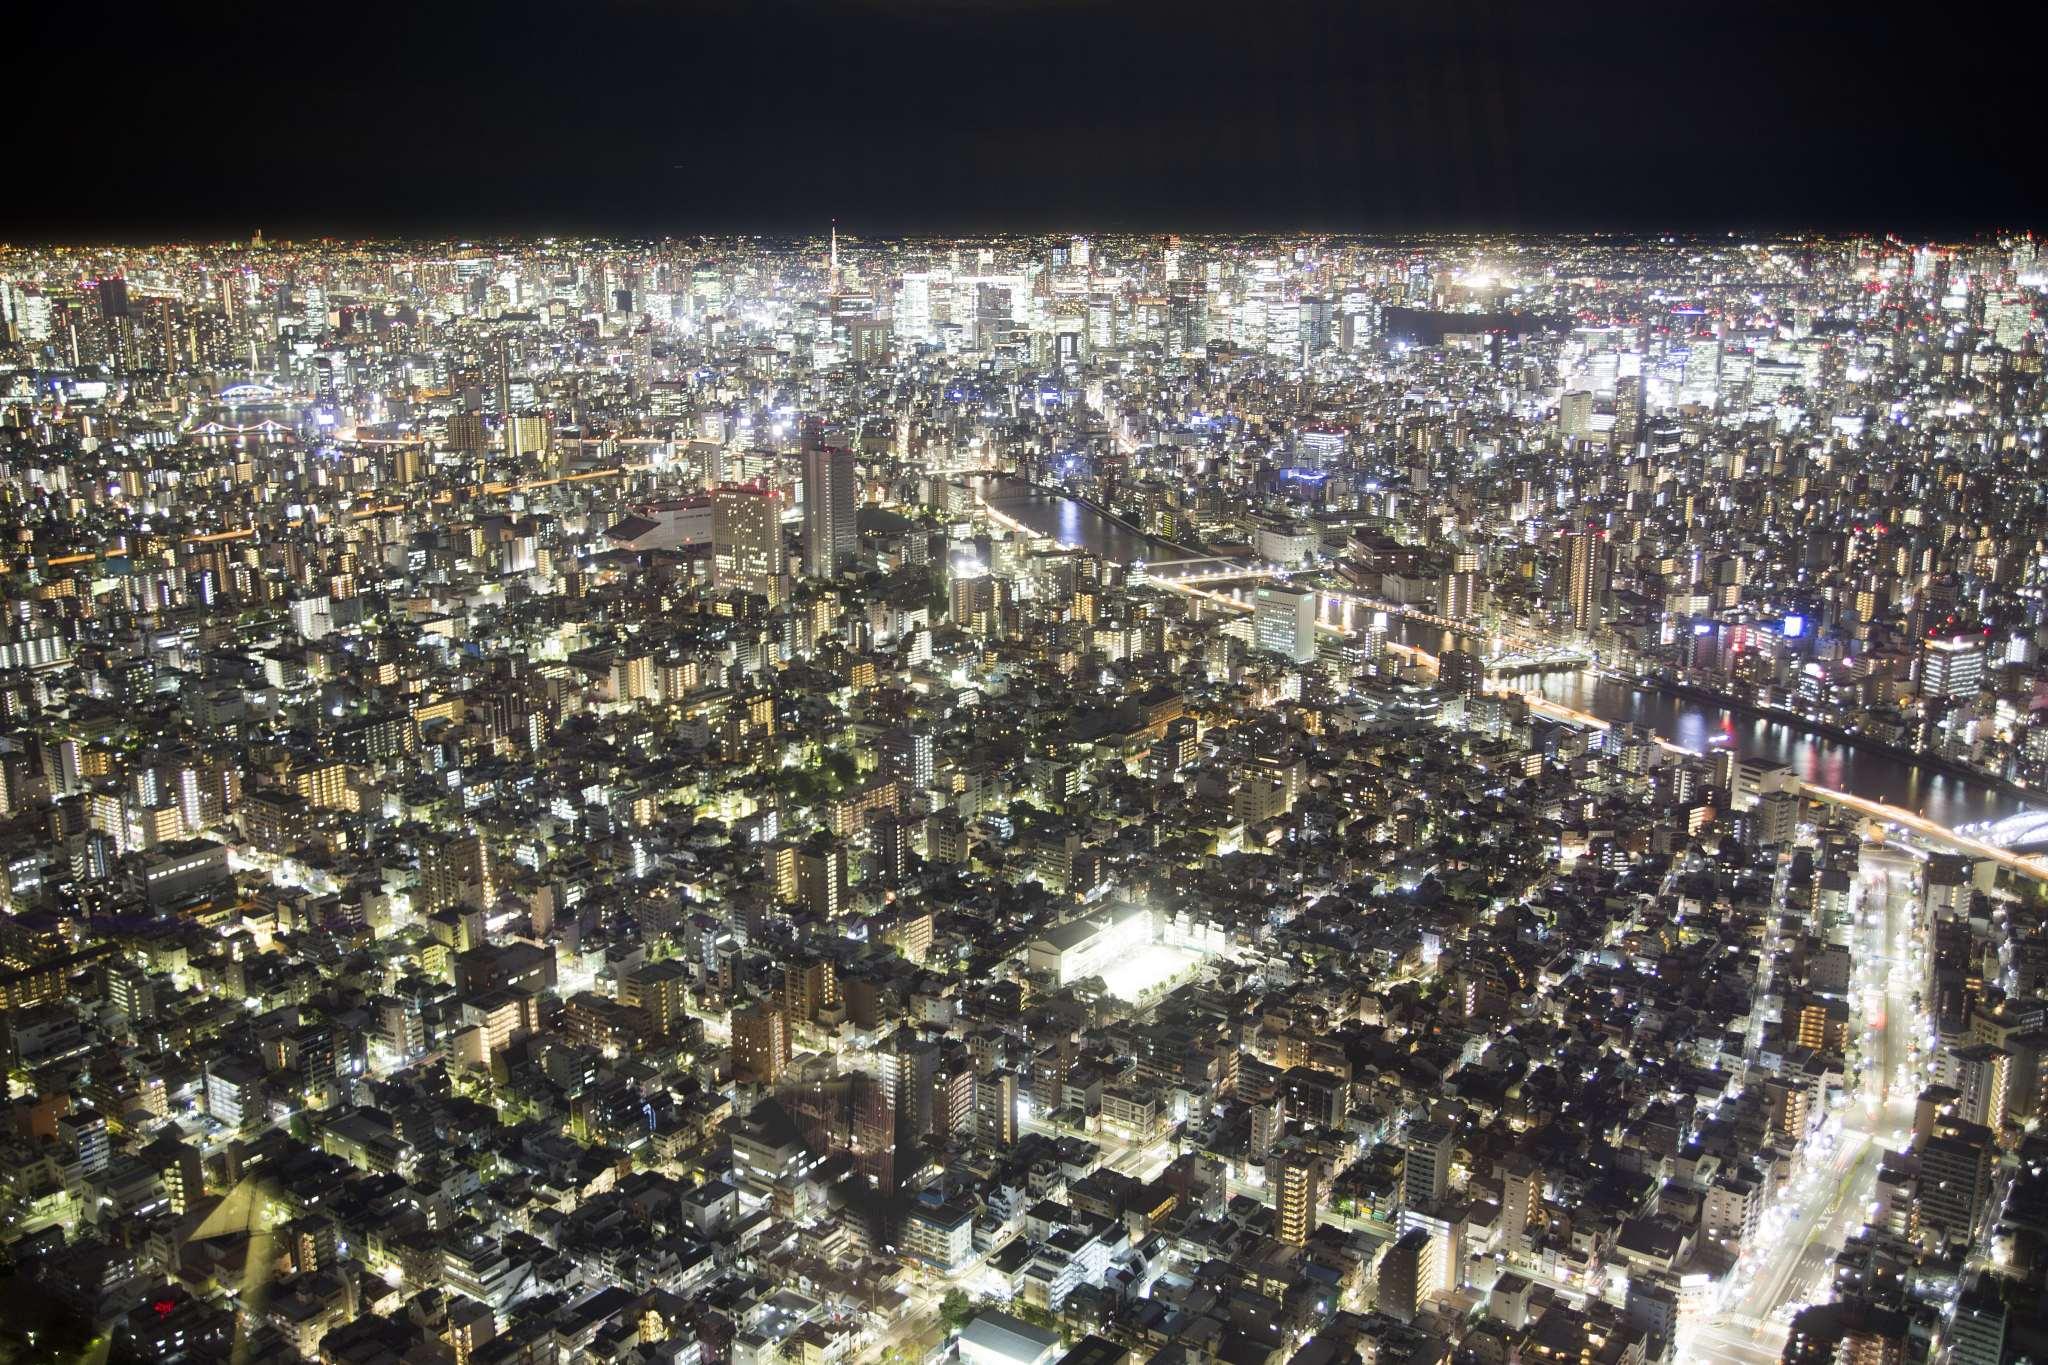 Tokyo from the air at night